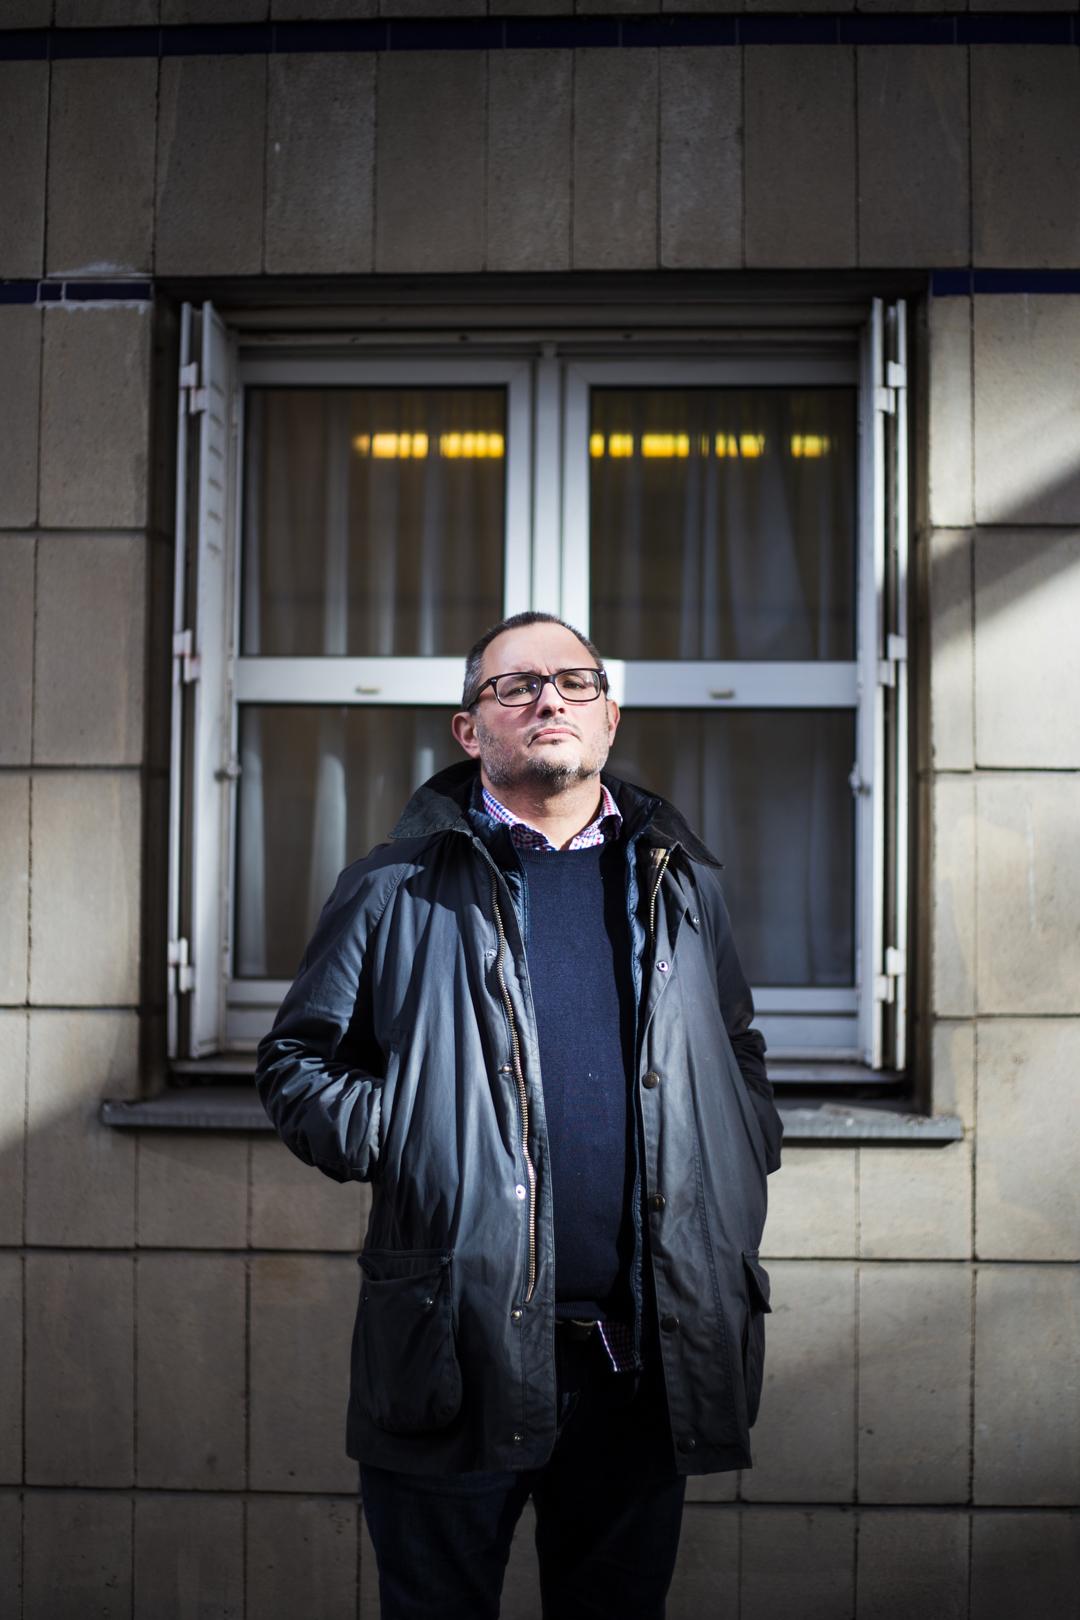 Yves Trottignon ancien agent DGSE